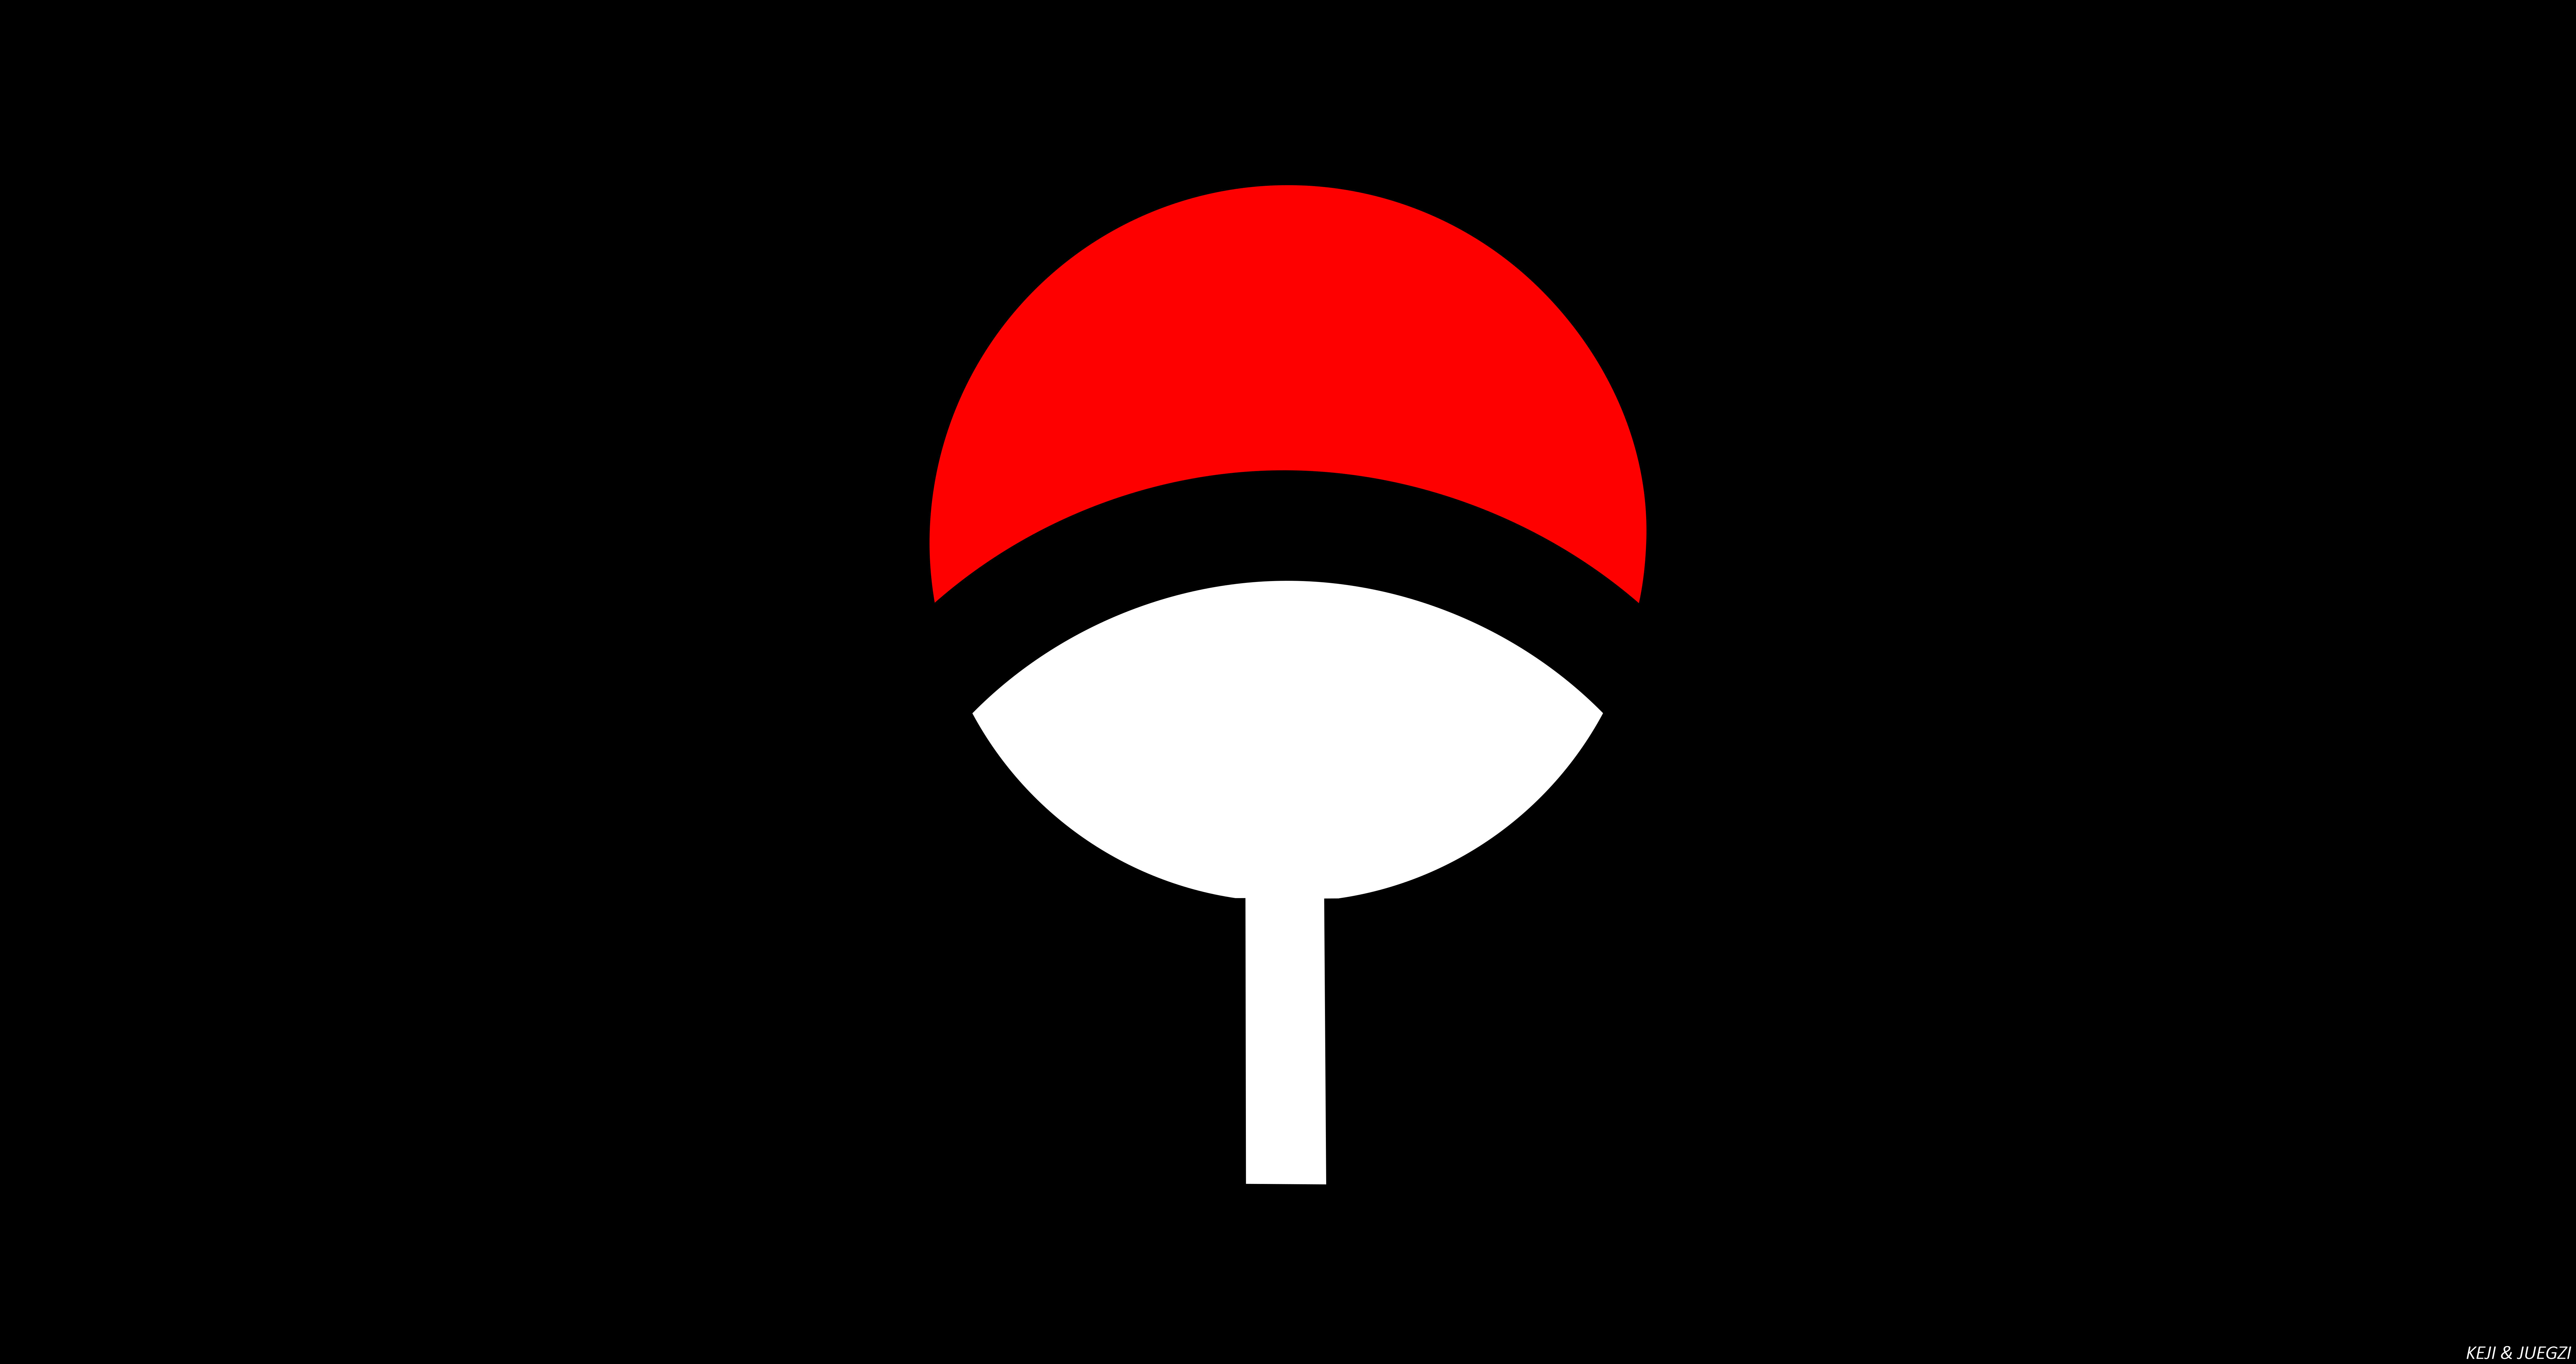 Uchiha Clan Symbol 8k Ultra Fondo De Pantalla Hd Fondo De